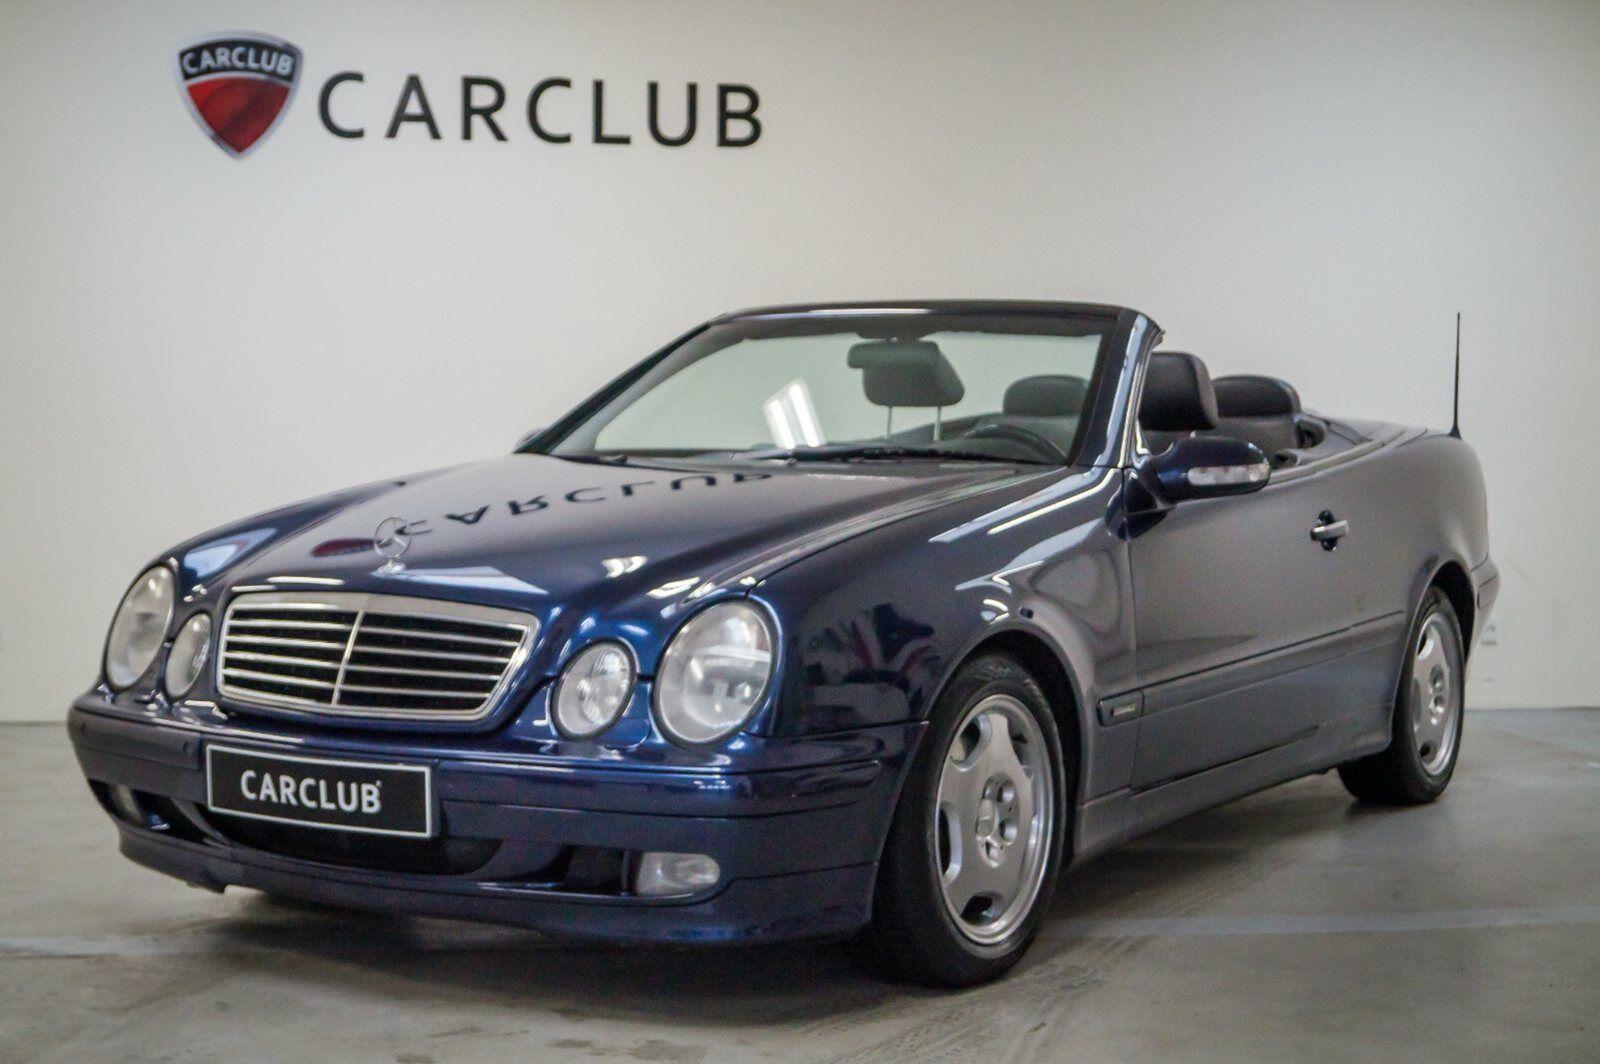 Mercedes CLK320 3,2 Cabriolet Elegance aut. 2d - 119.900 kr.